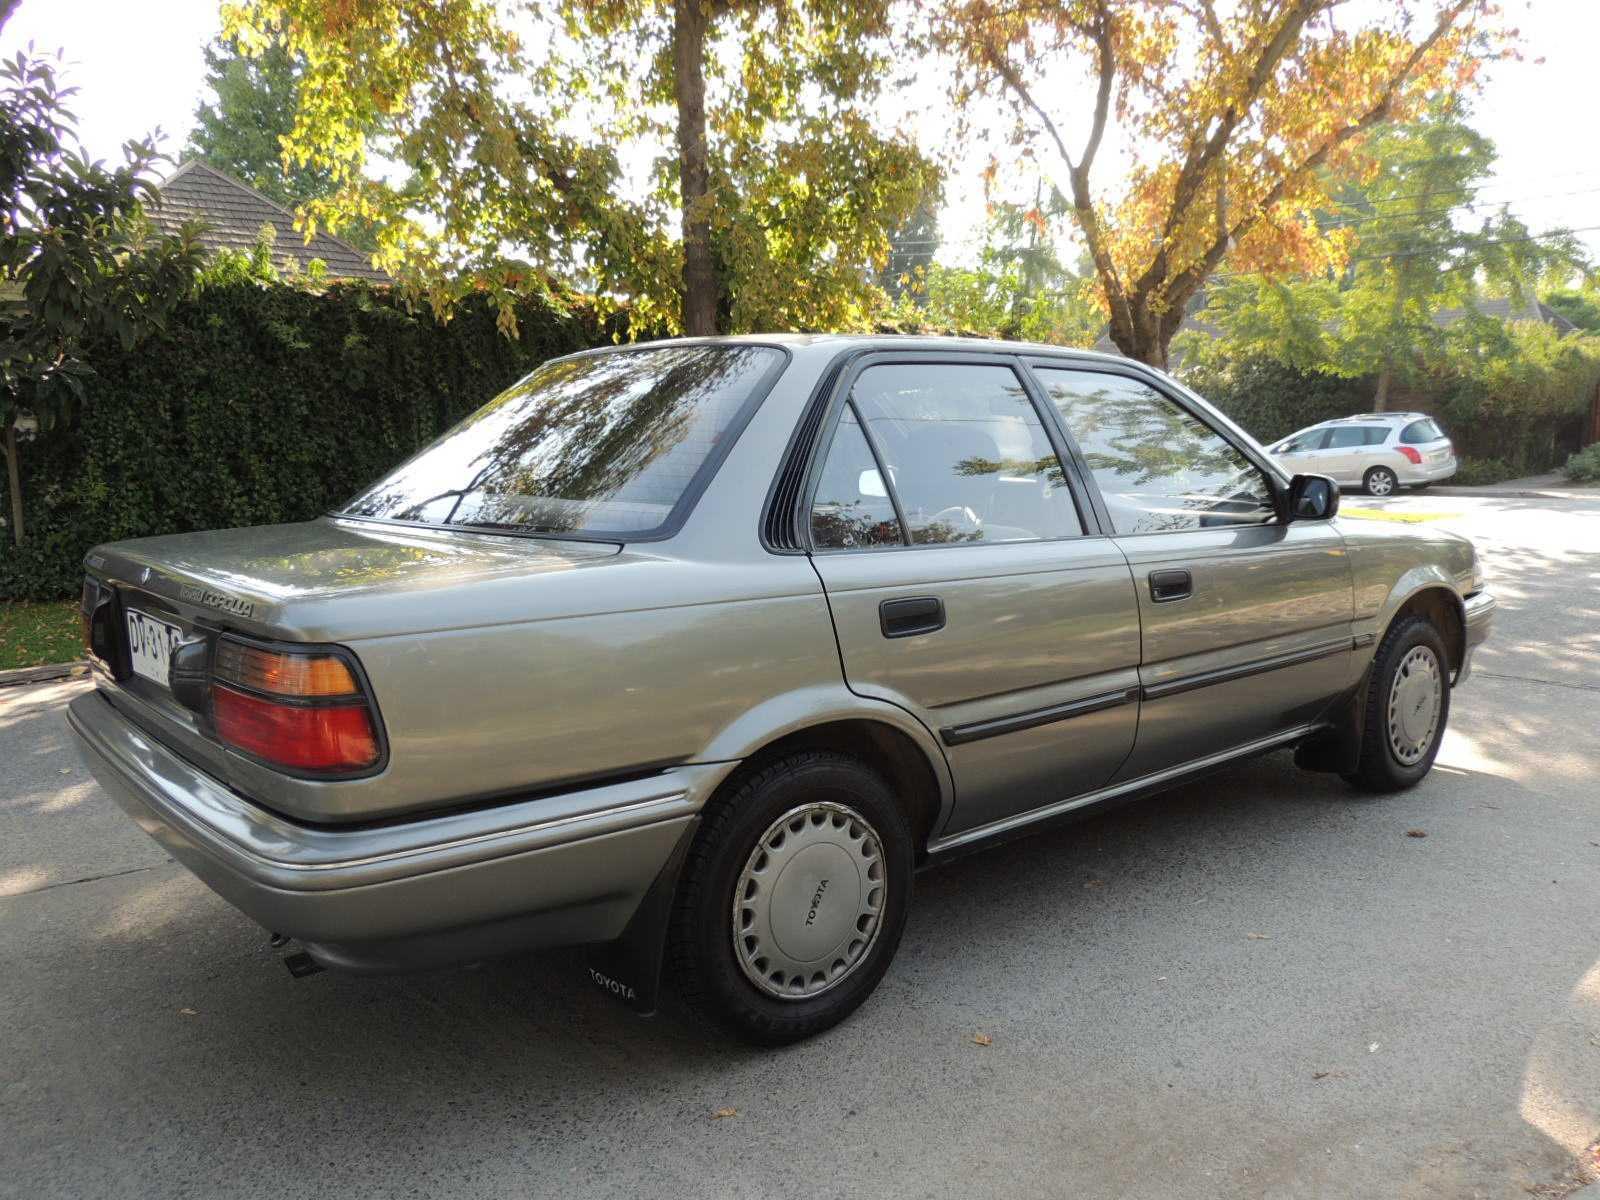 Toyota Corolla 1992 Flaco Farias Retrotest (22)